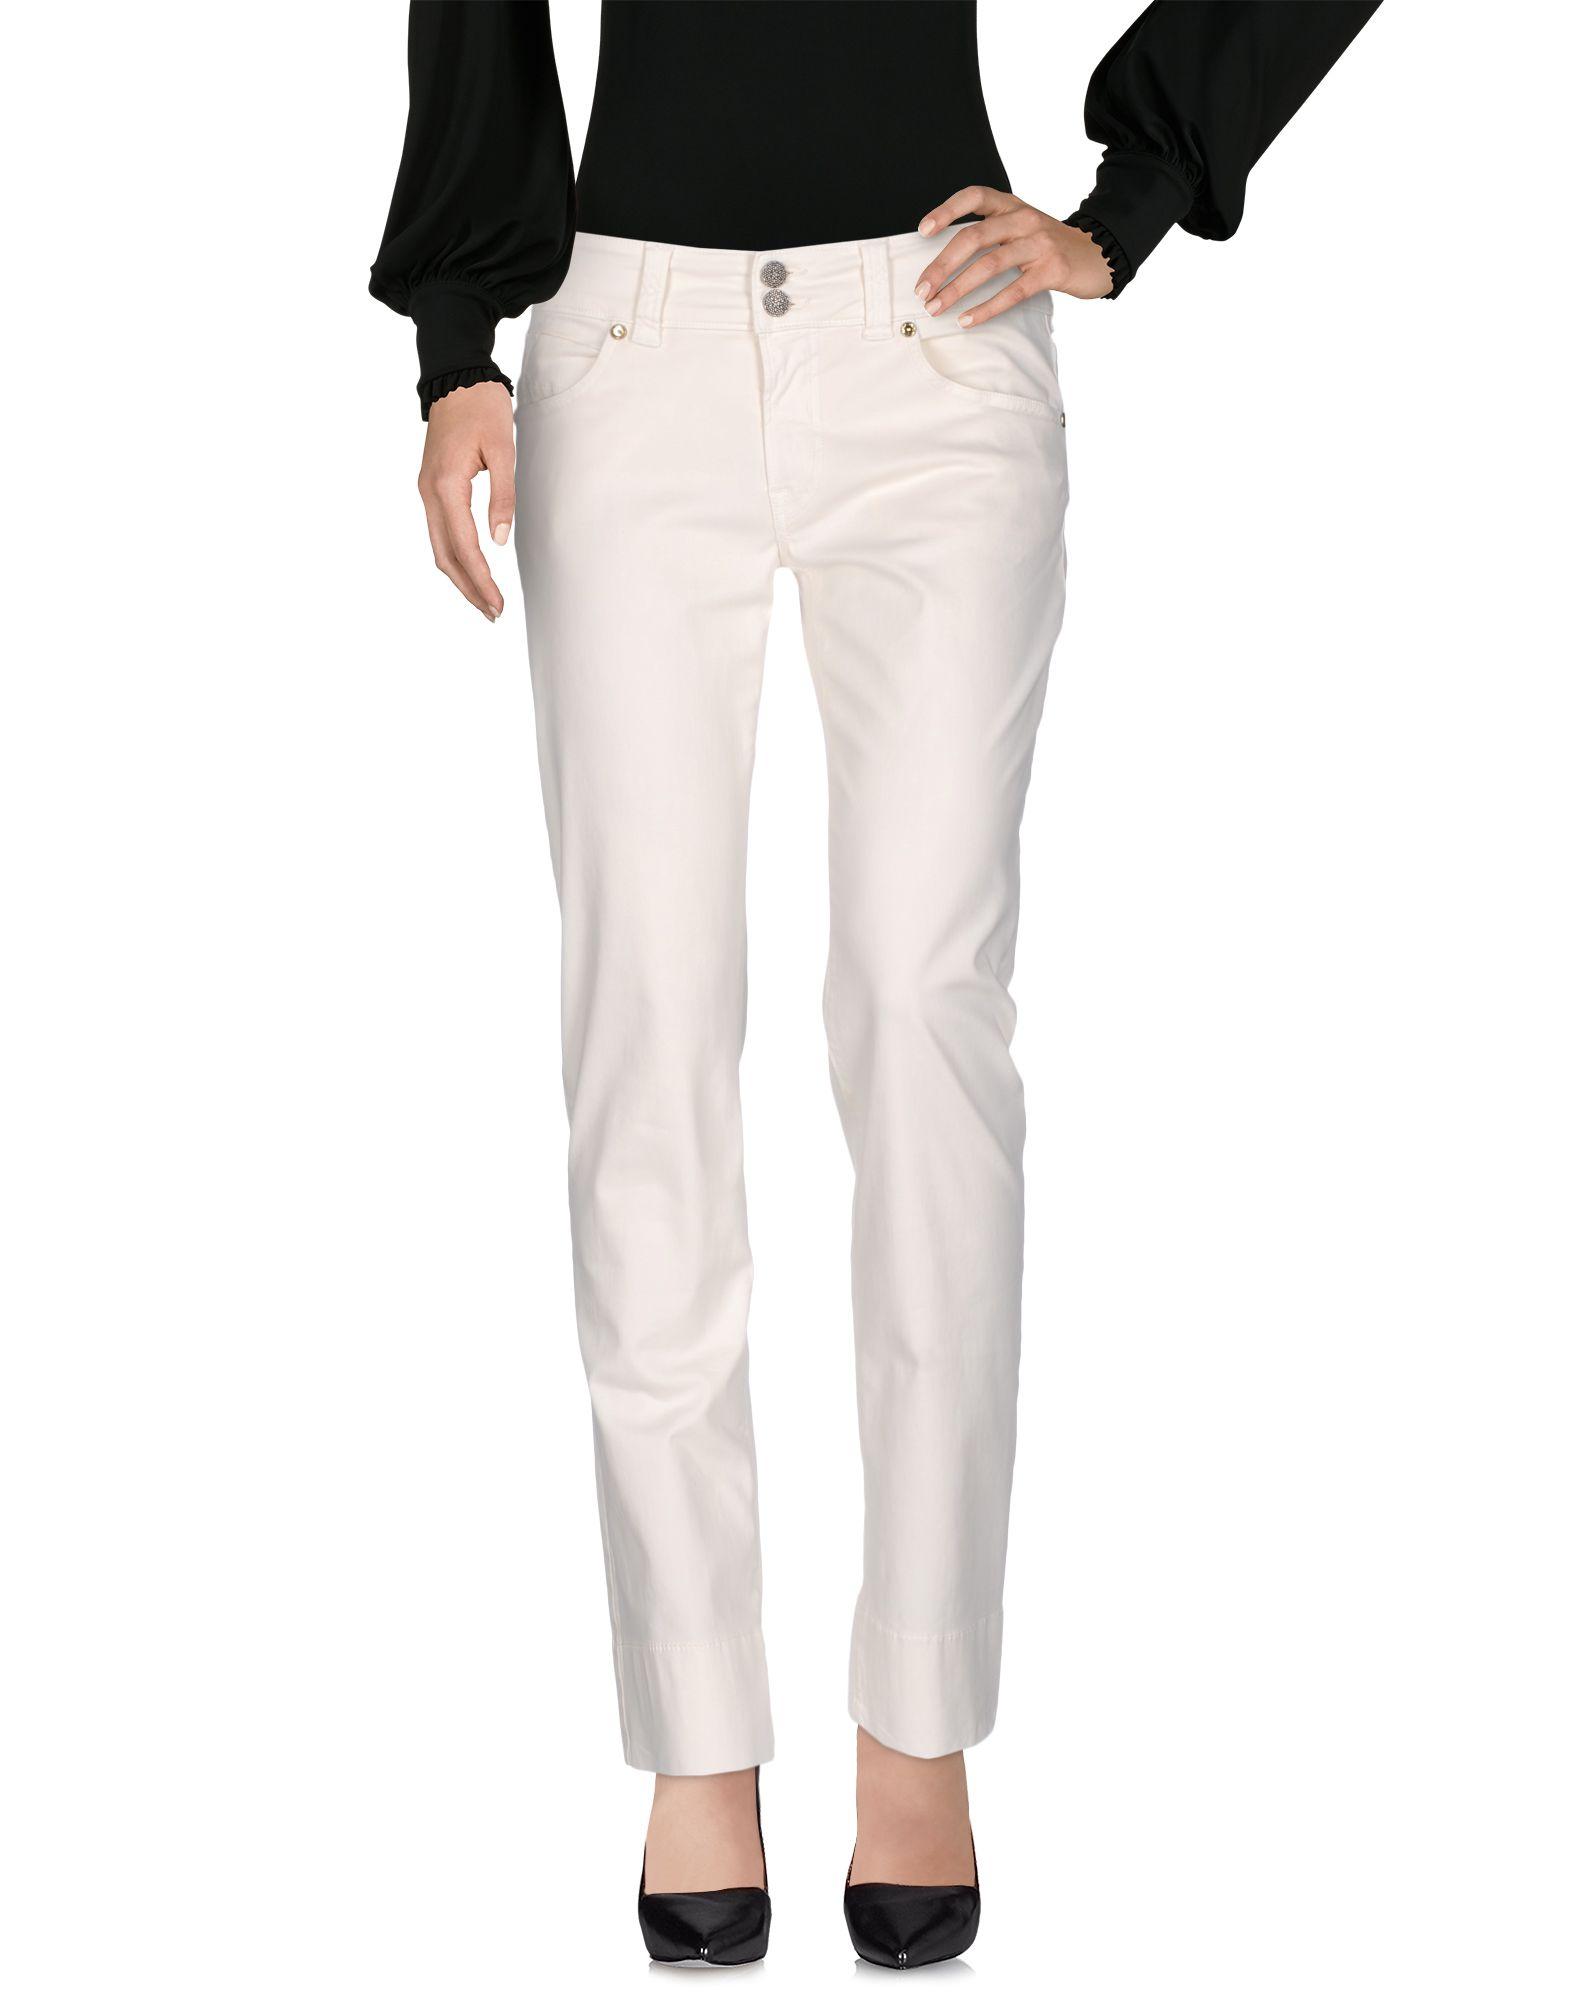 NOLITA Повседневные брюки блуза nolita nolita mp002xw0e229 page 3 page 5